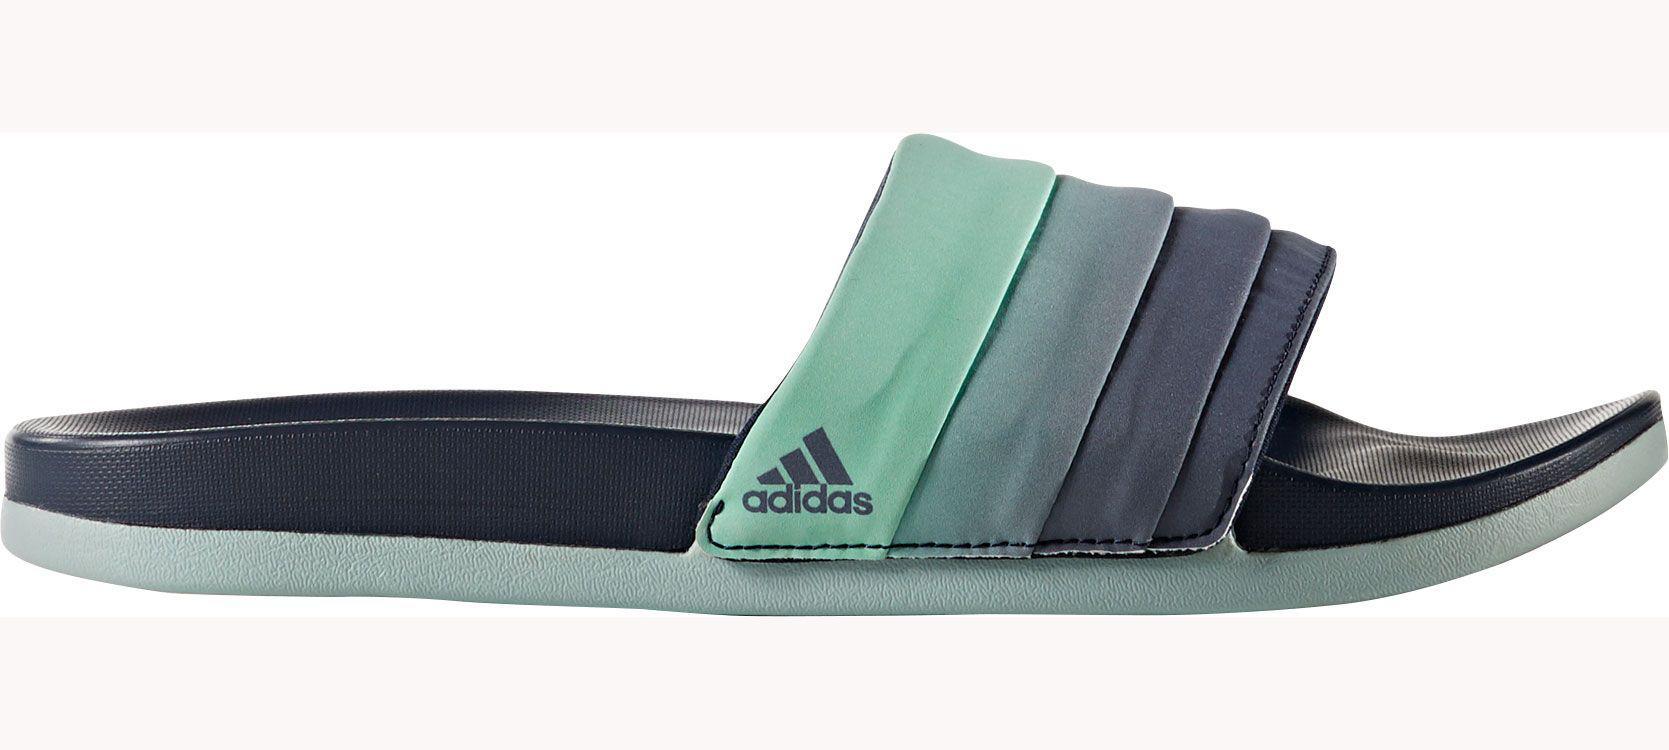 95b45563052b6 Lyst - adidas Adilette Cloudfoam Plus Slides in Green